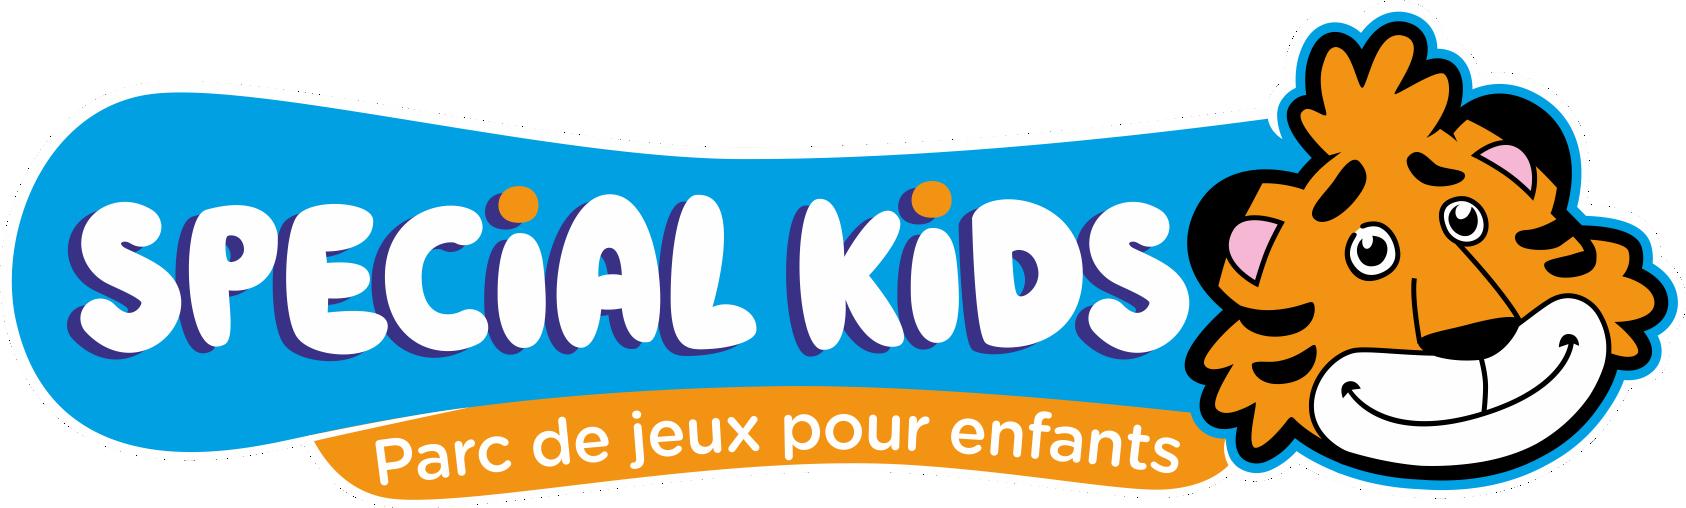 Image Spécial Kids - Lieusaint